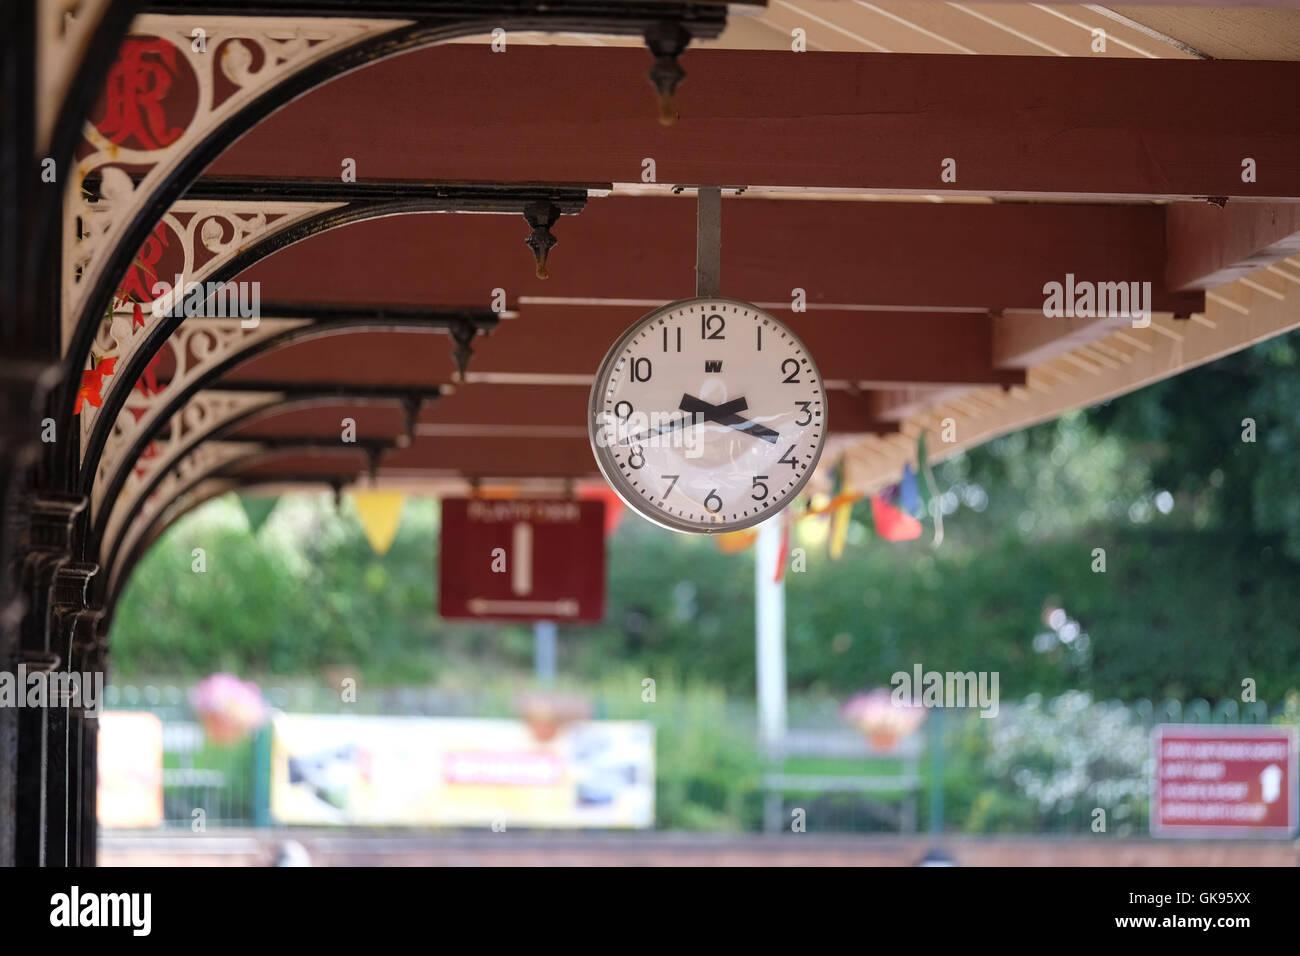 Ravenglass station clock - Stock Image